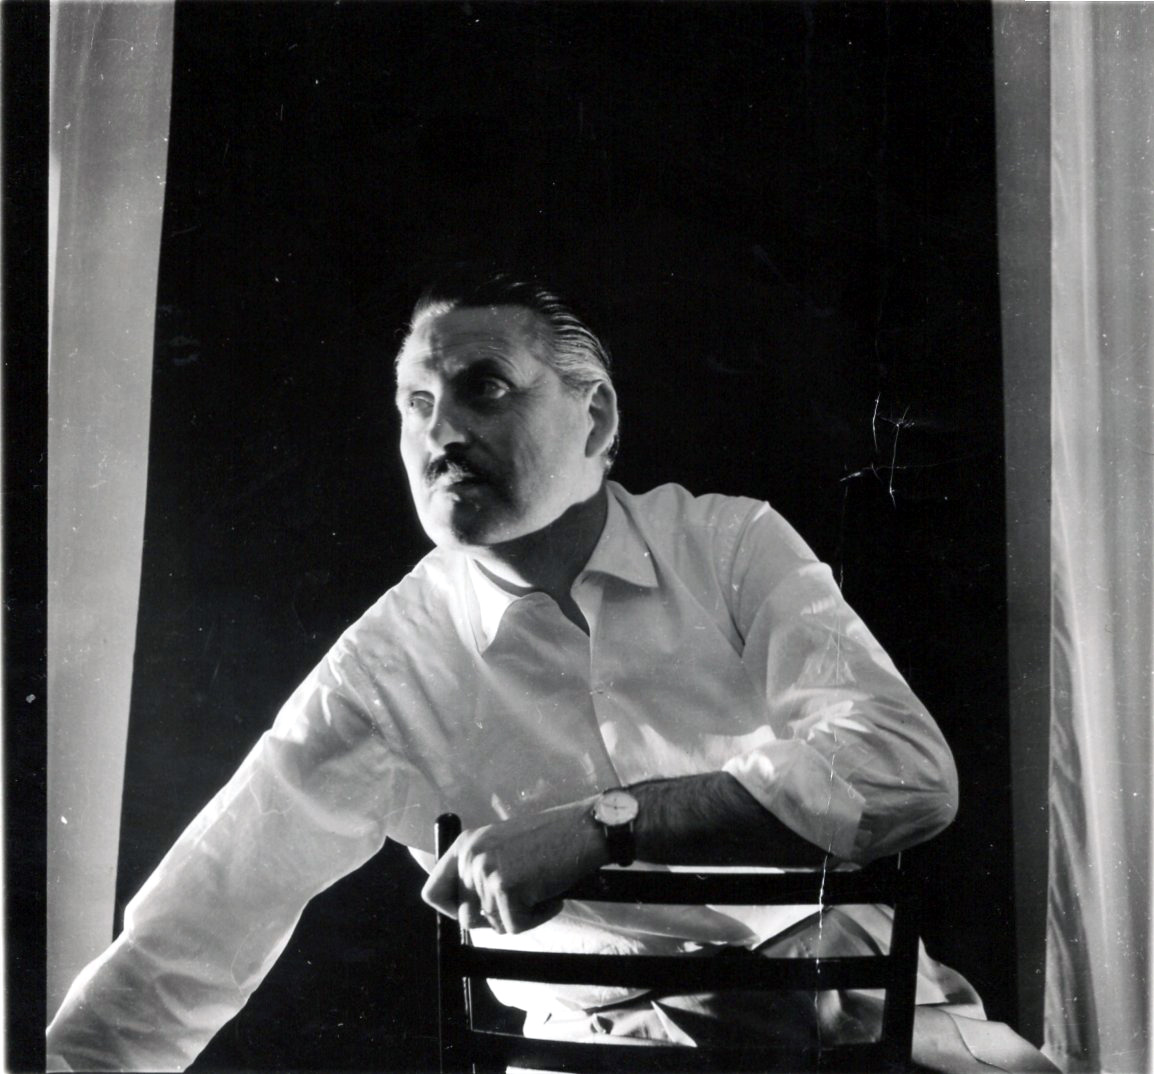 Franco Grignani, portrait